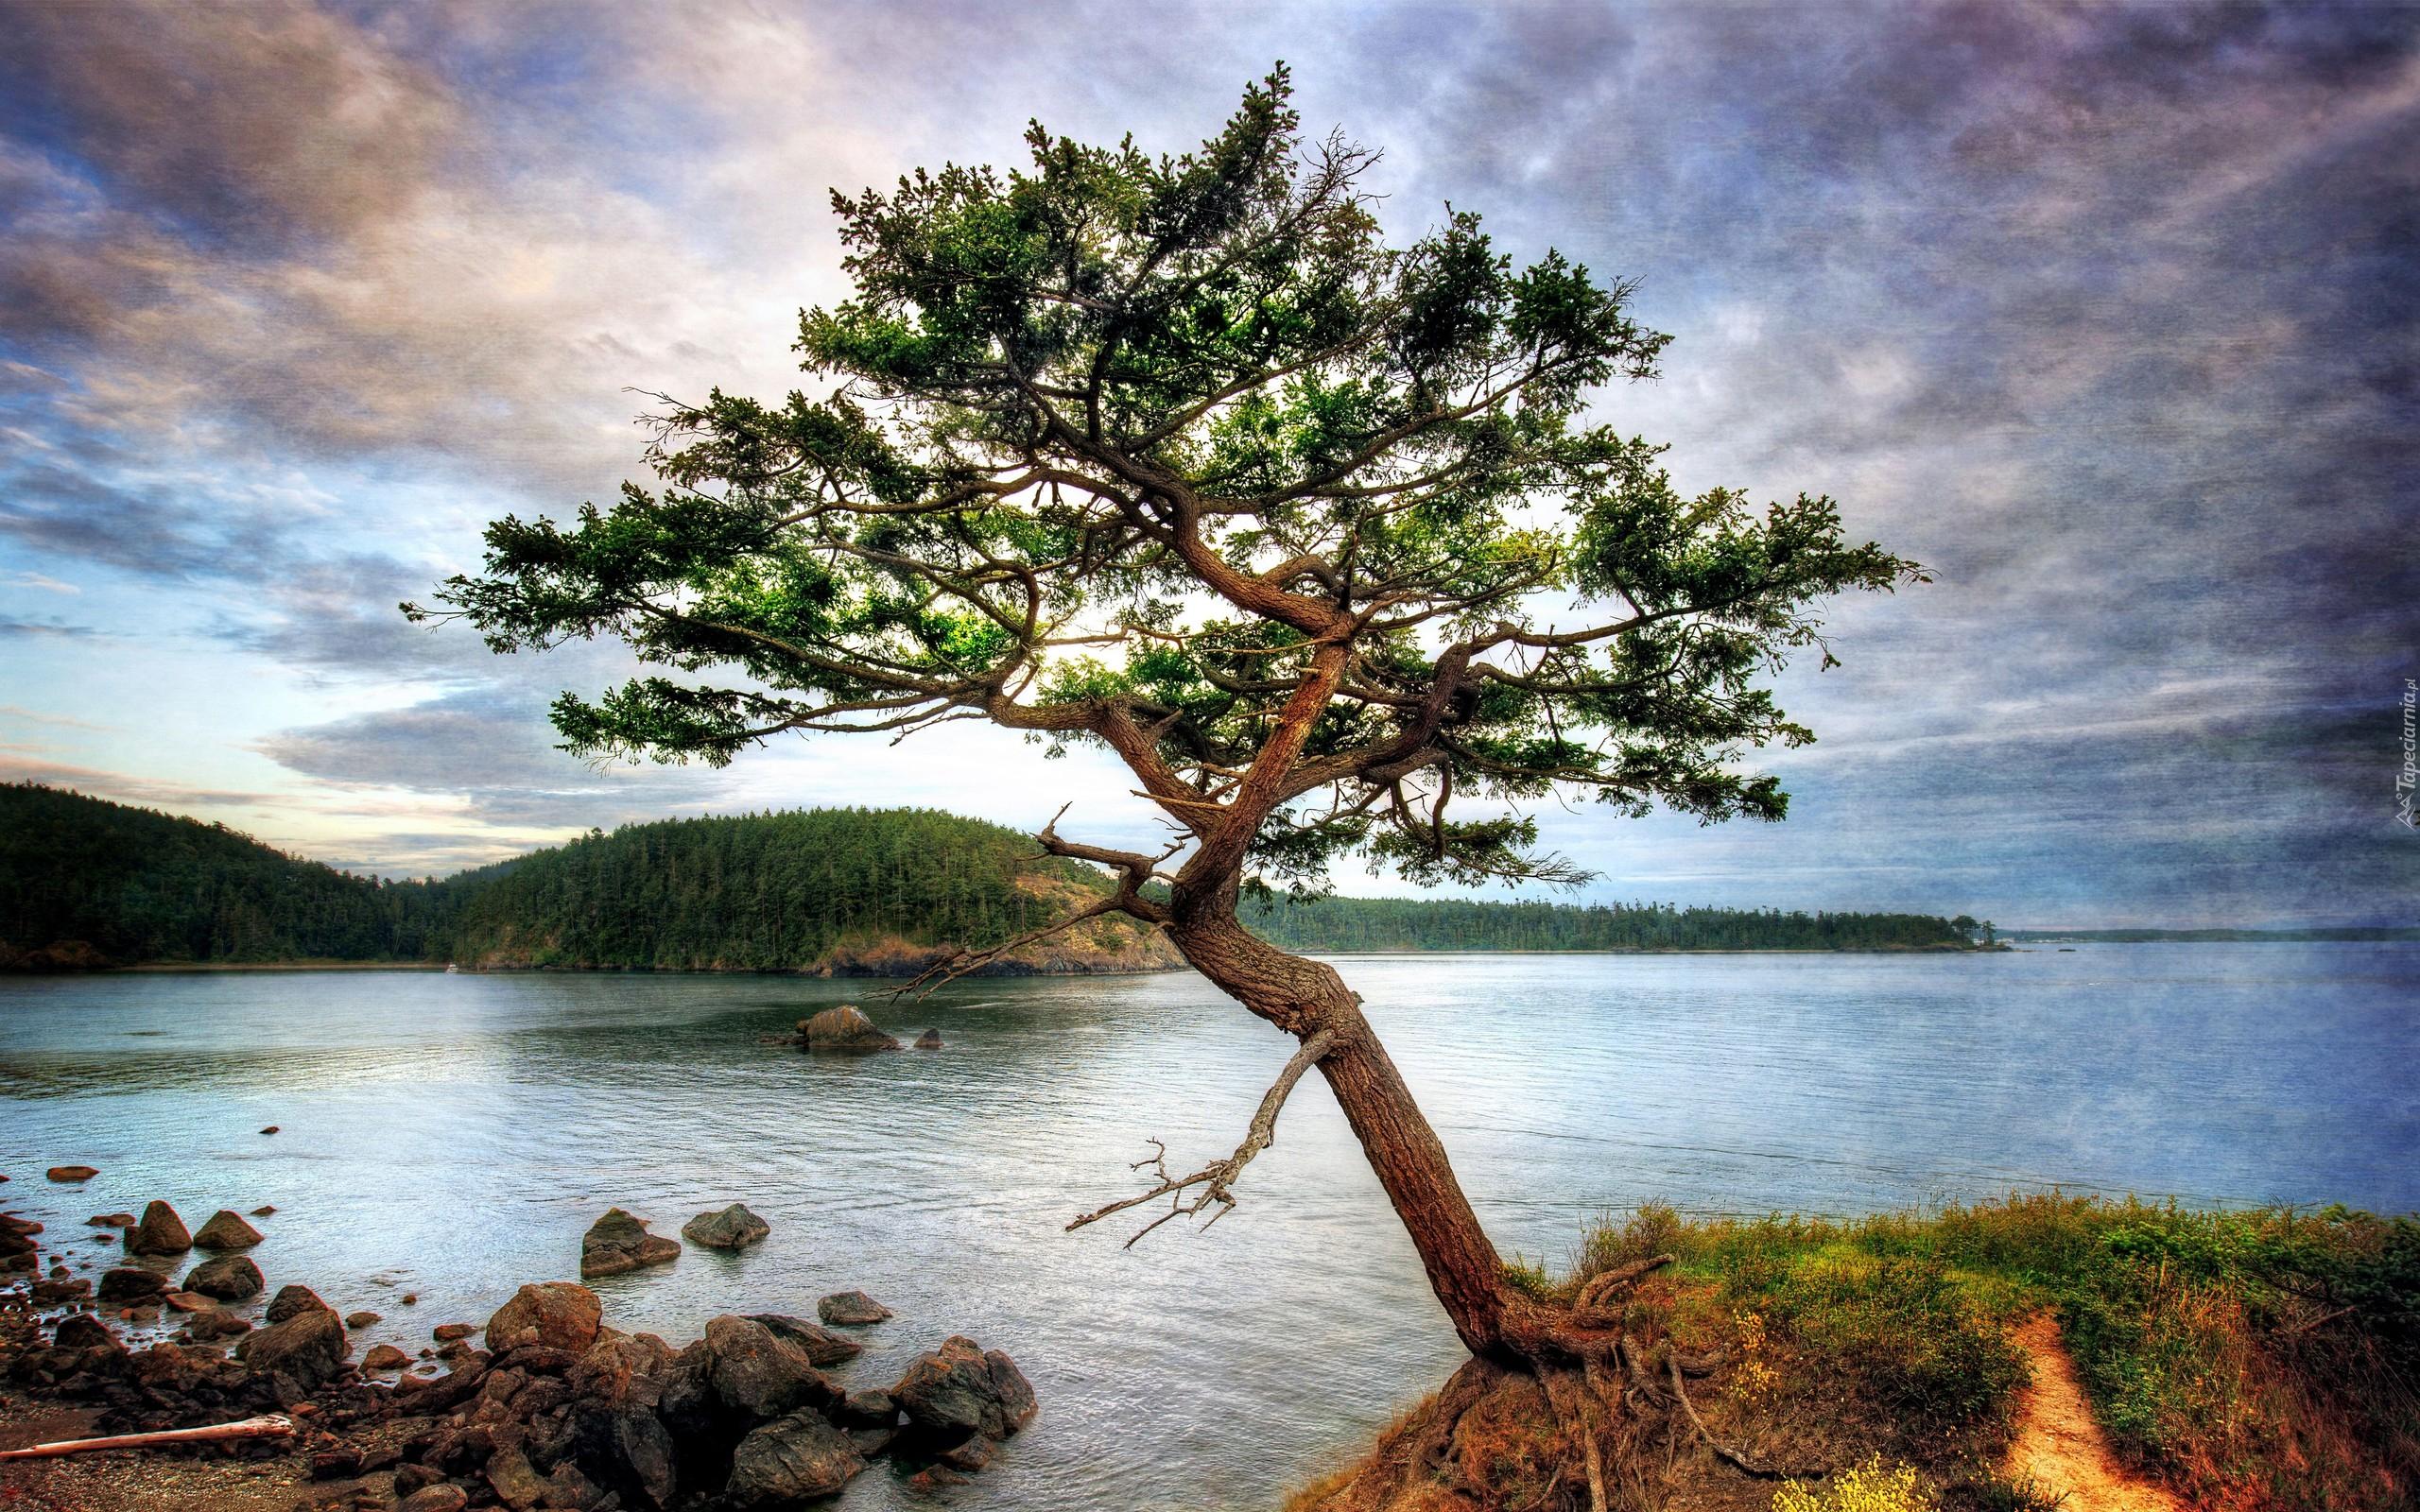 Rzeka kamienie for Beautiful drawings of trees